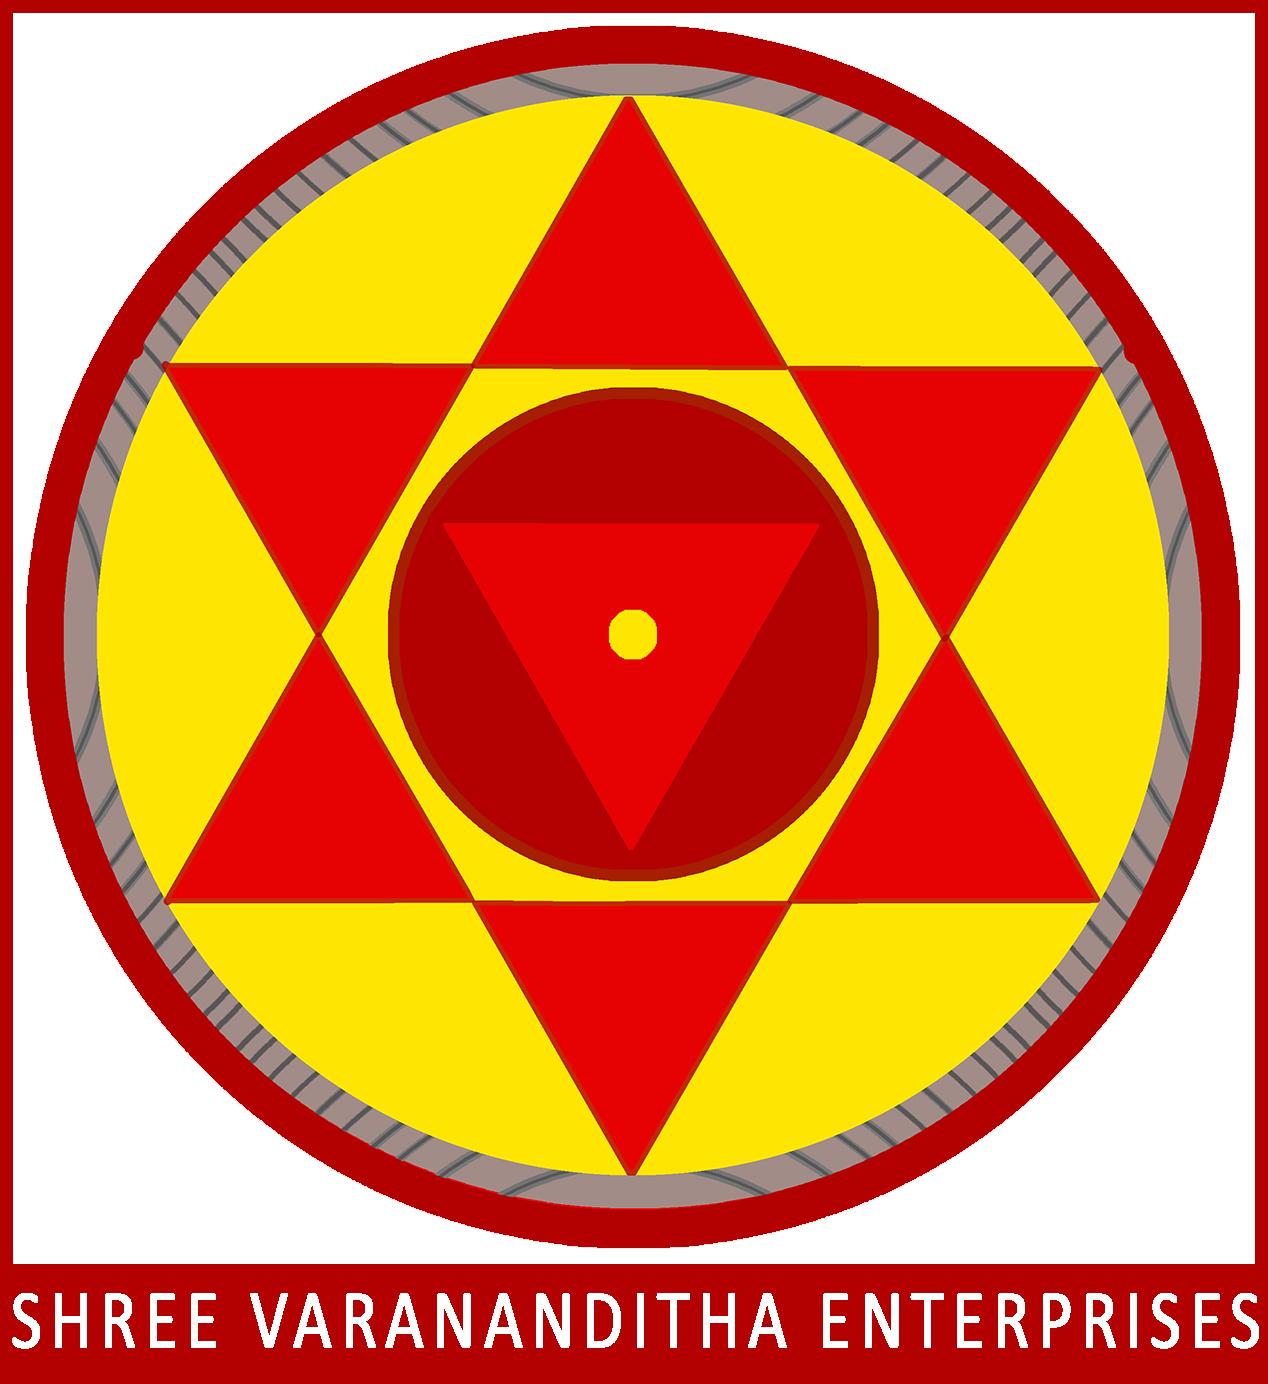 Shree Varananditha Enterprises